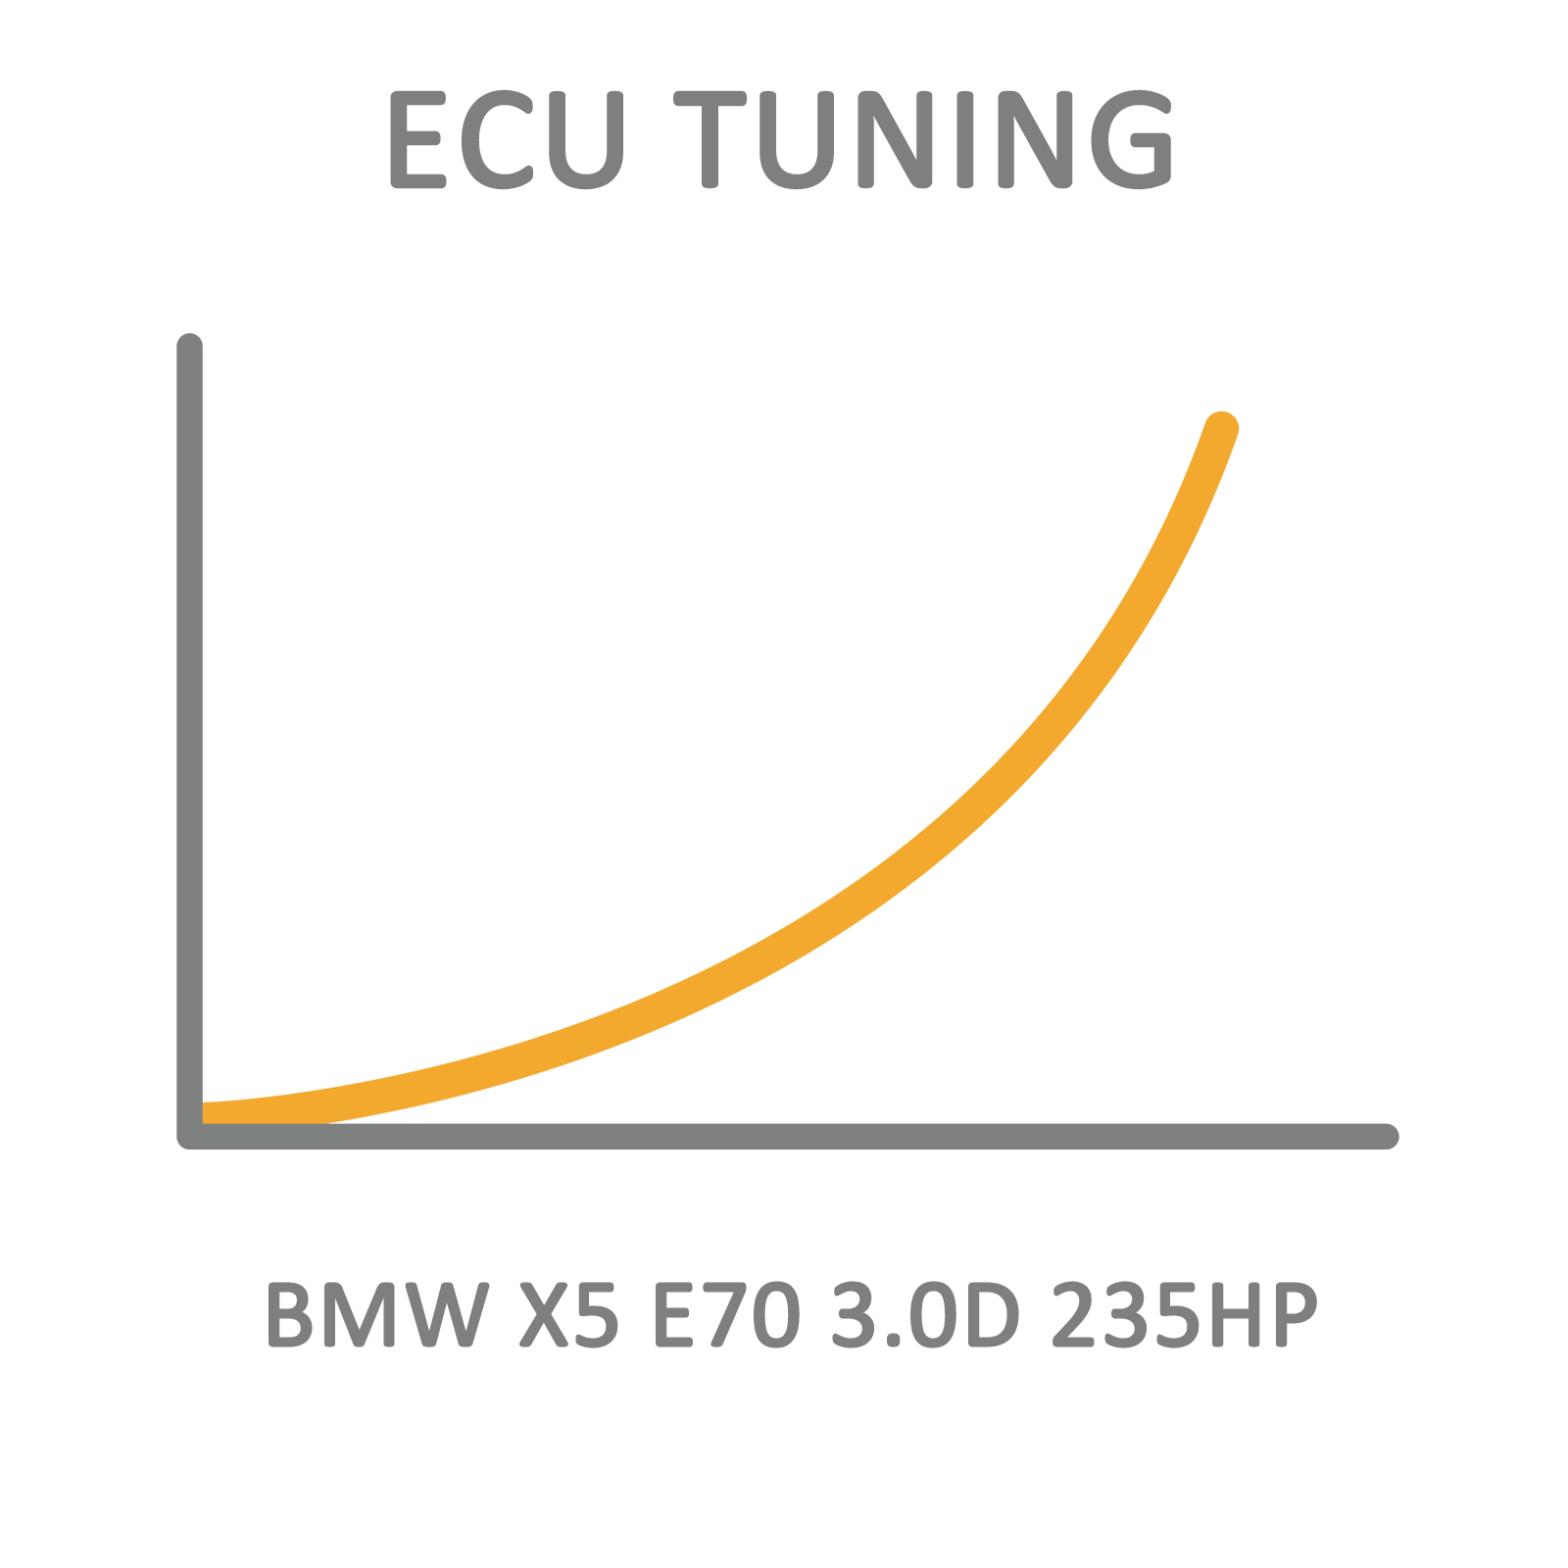 BMW X5 E70 3.0D 235HP ECU Tuning Remapping Programming